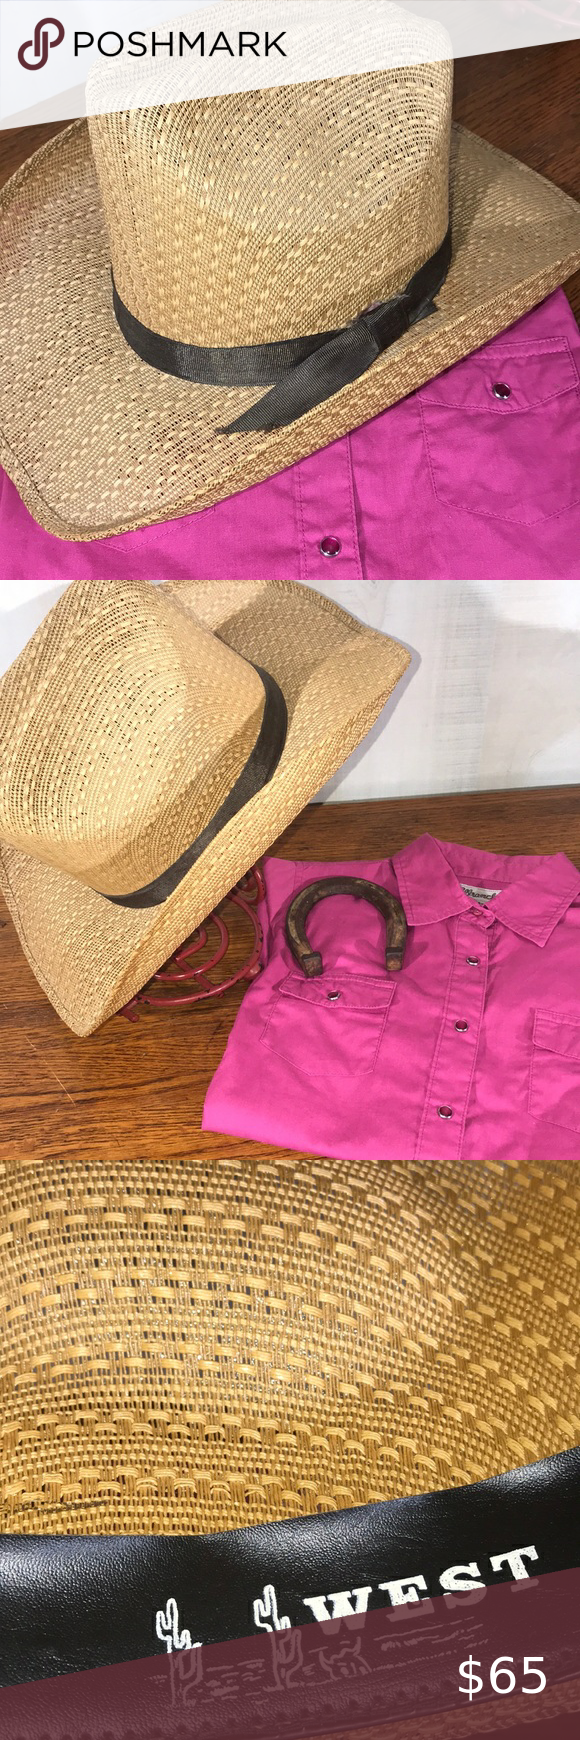 Vintage Straw Cowboy Hat Size 6 7 8 Vintage Maral Hats Western Wear Cowgirl Hat Size 6 7 8 Hat Band Ribbon Is Showing A Straw Cowboy Hat Cowgirl Hats Hat Sizes